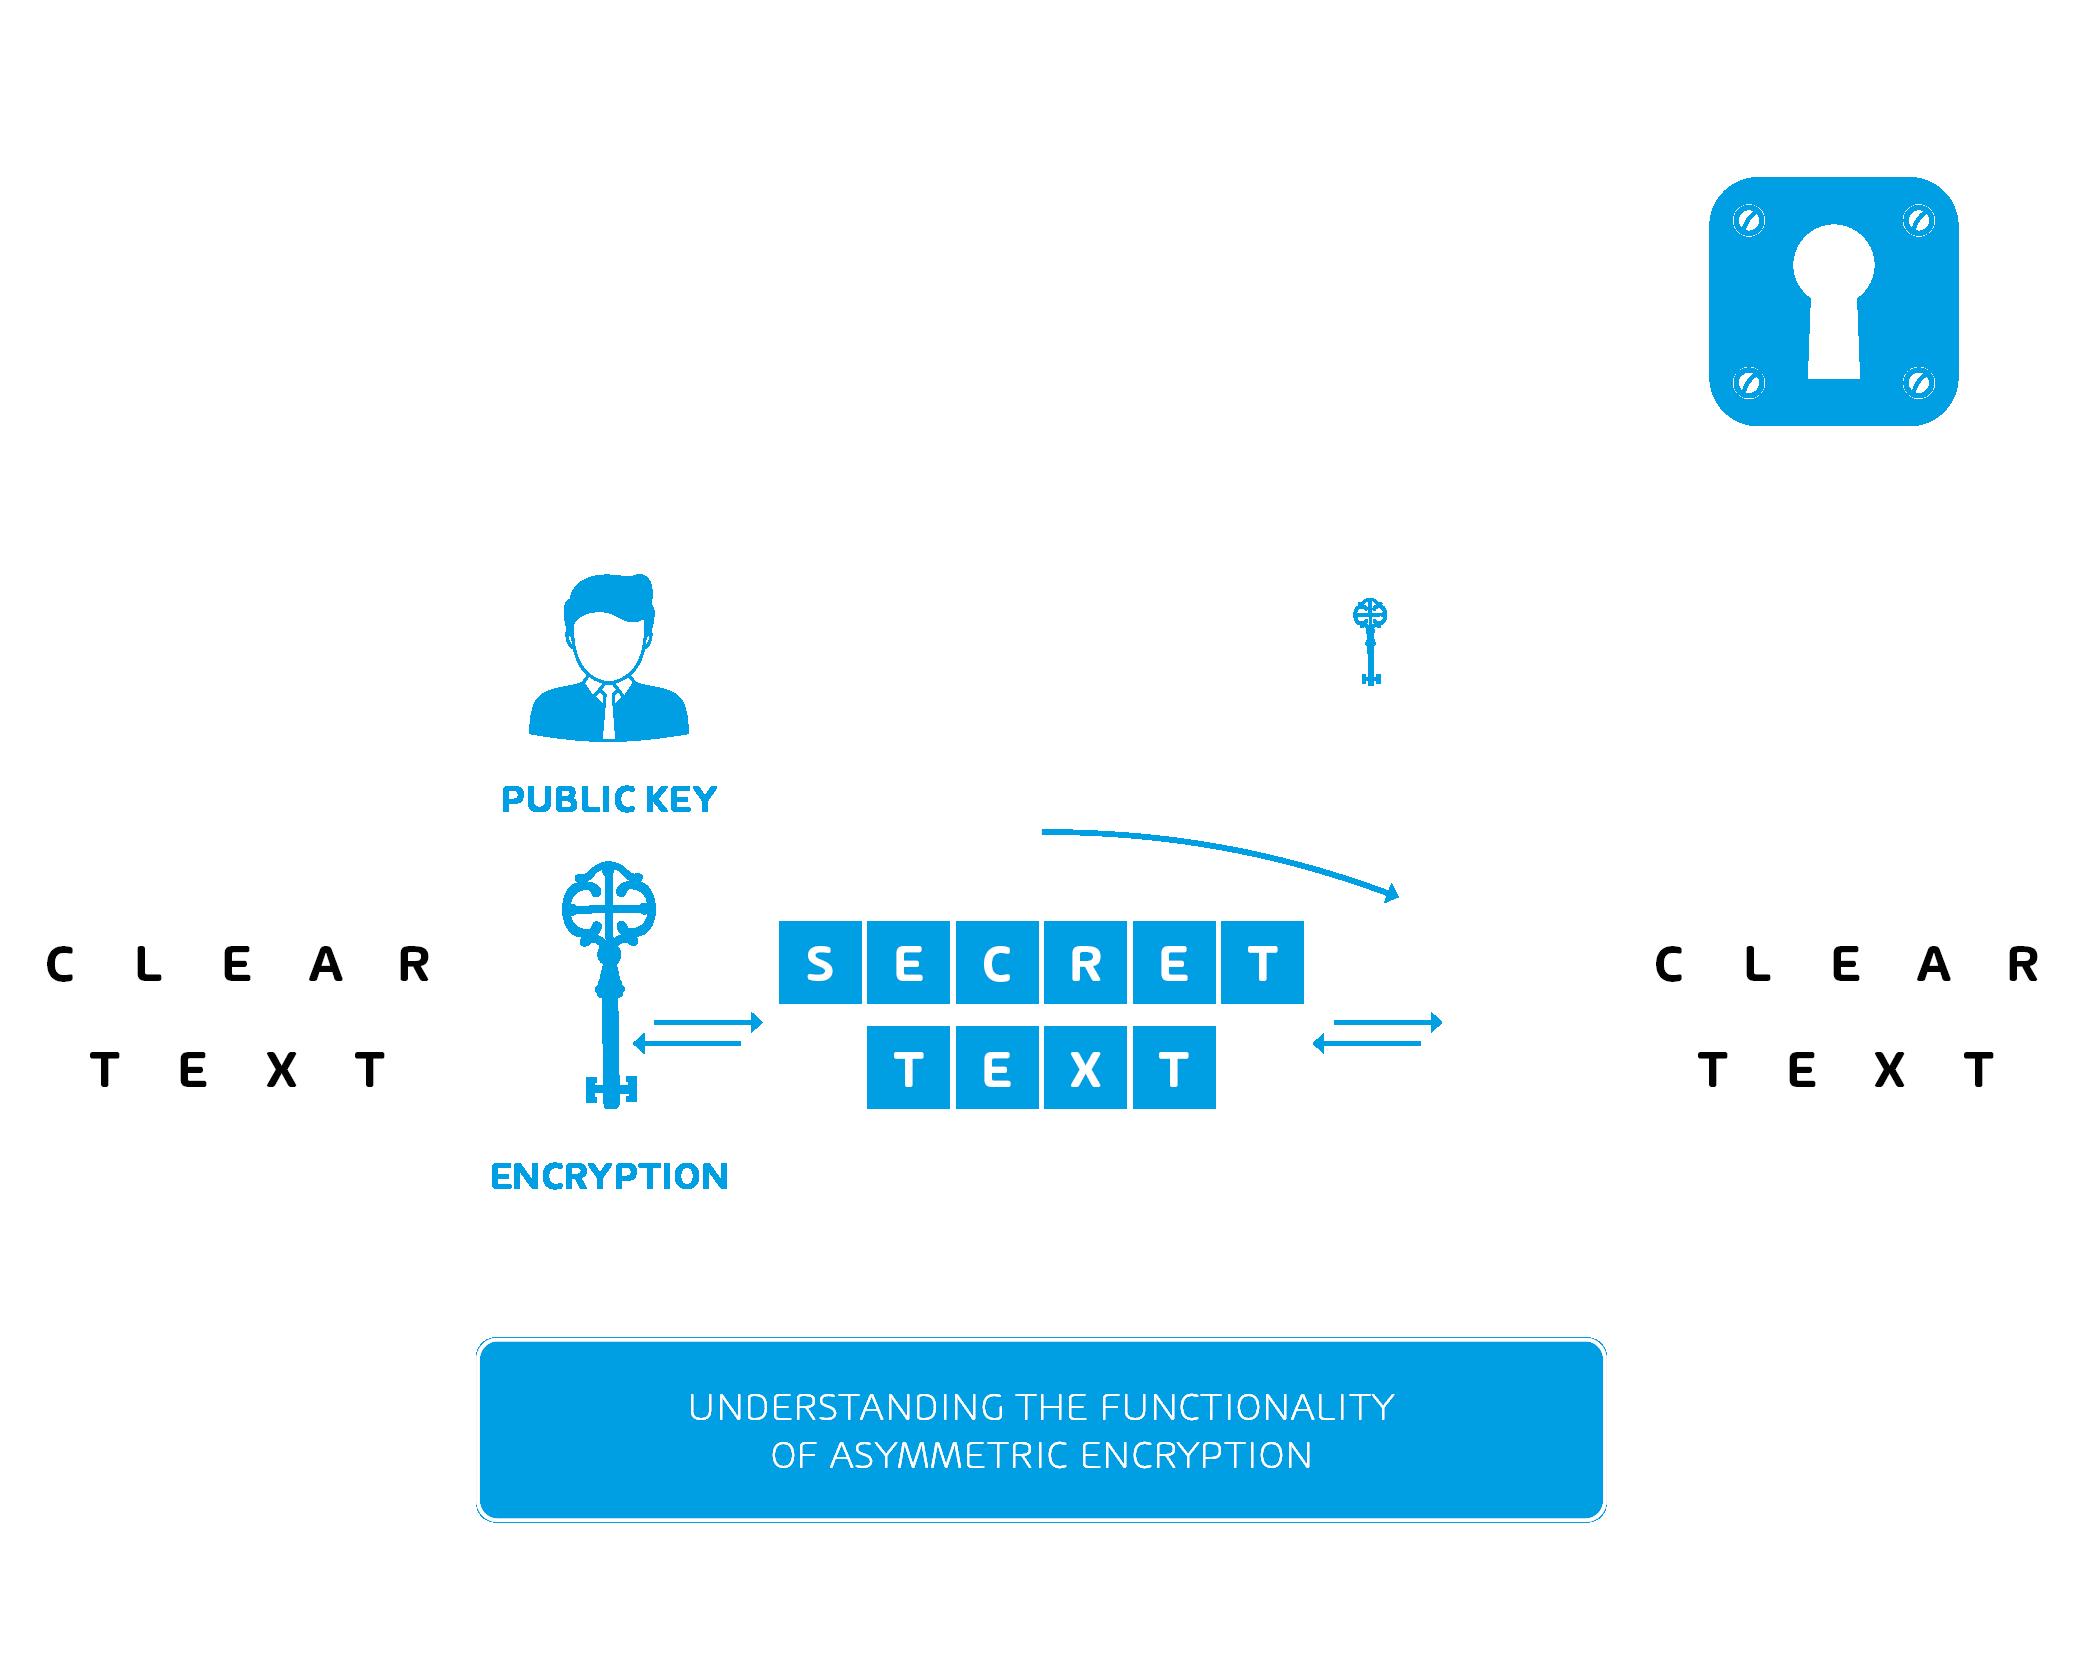 Infographic about Asymmetric Encryption